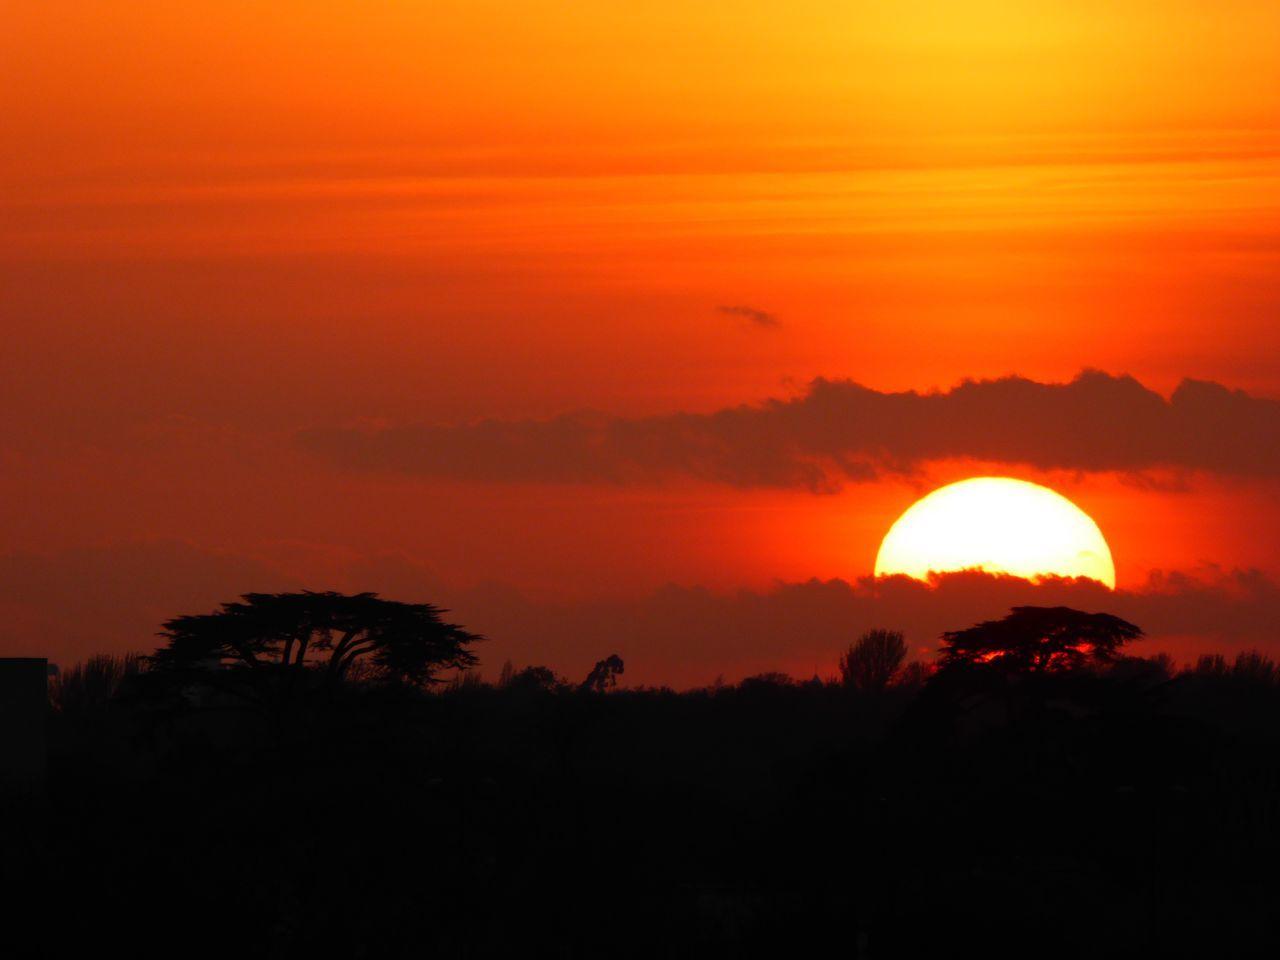 Sunset Sunset_collection Landscape Red Red Sunset Silhouette Silhouettes Sunset Silhouettes Setting Sun Fiery Sunset... Fiery Sunset Fiery Sky Landscape_Collection Landscape_photography Amazing Sunset Settingsun Beautiful Sunset Brentford London LONDON❤ Hidden Gems